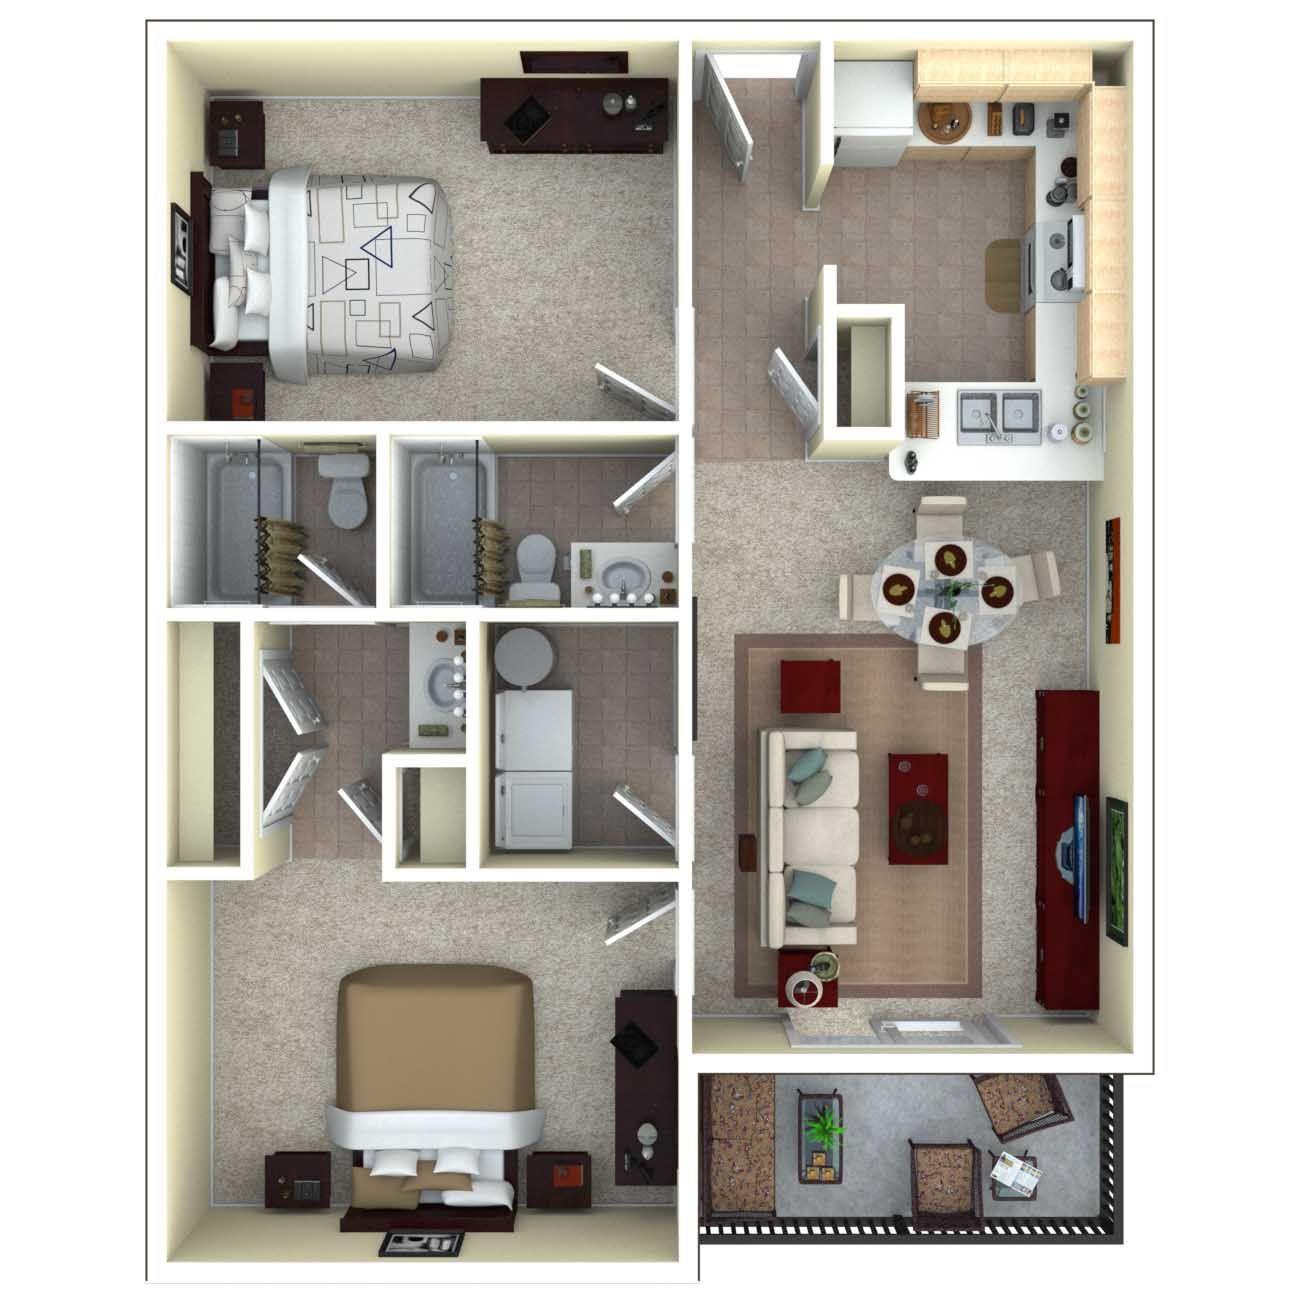 Design My Own Kitchen Online Free: 3d Floor Plan Apartment - Google Search